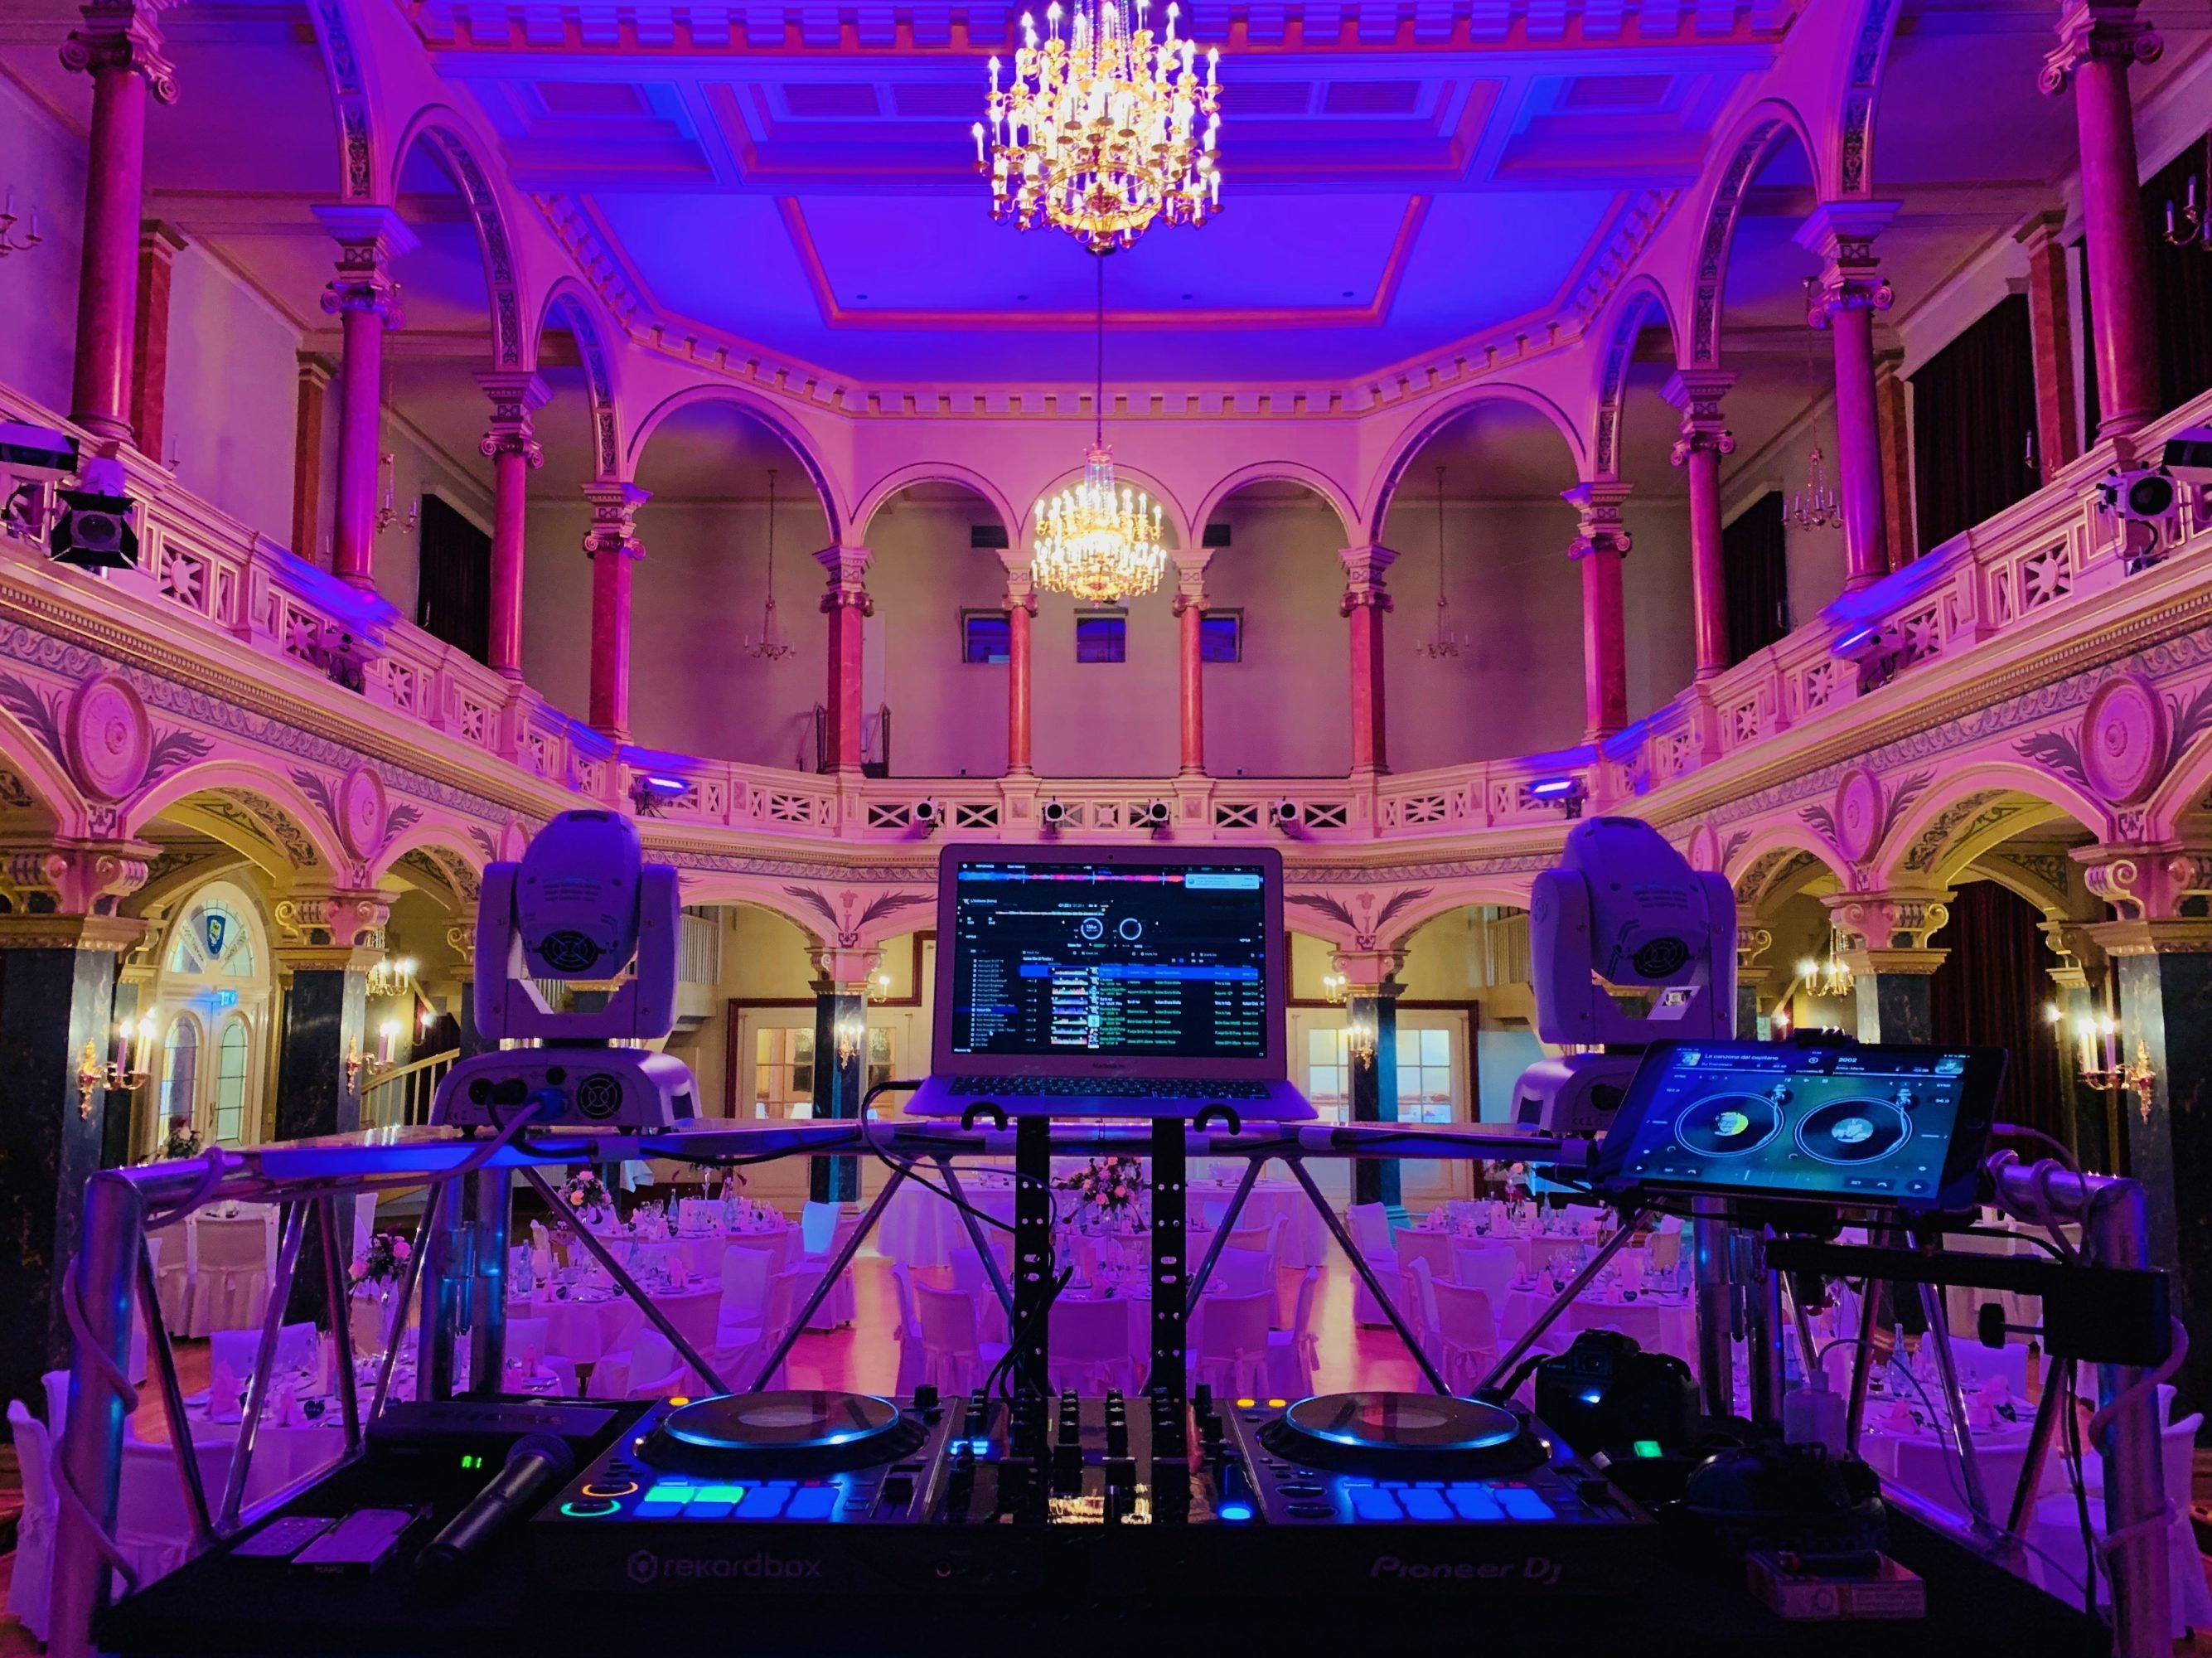 Hochzeits DJ Stuttgart, DJ Ludwigsburg, DJ Esslingen, DJ Böblingen. Italienischer Hochzeits DJ